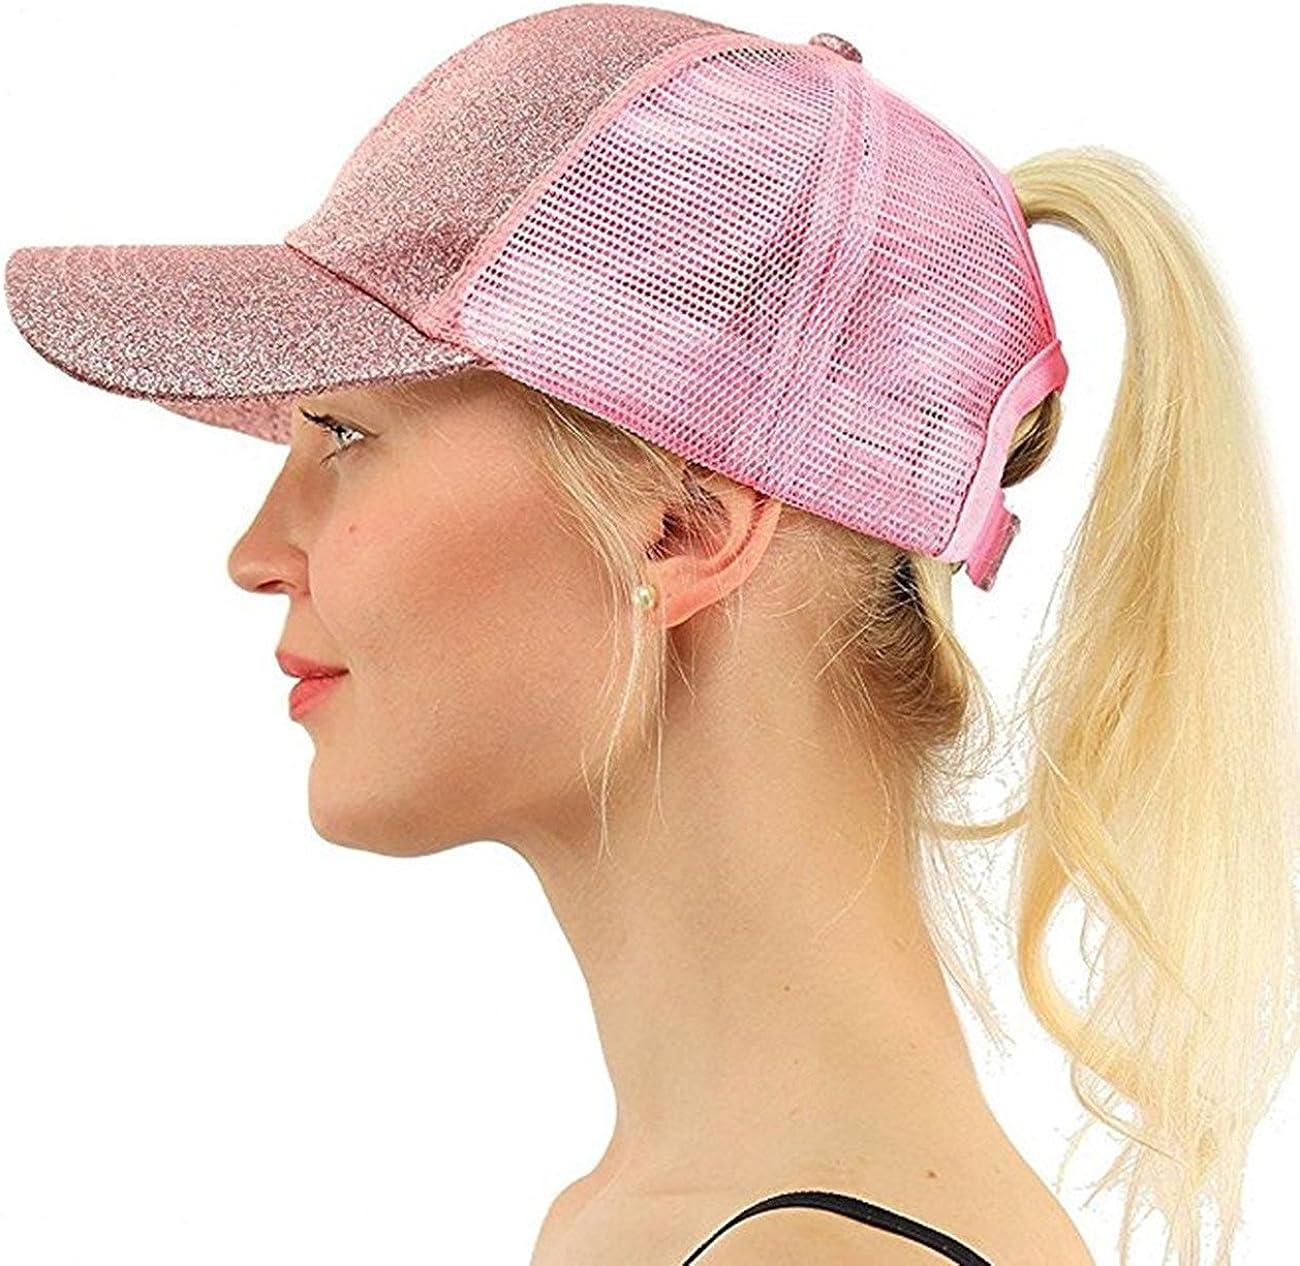 M/_Eshop 2 Pack of Ponytail Baseball Cap Messy High Bun Adjustable Mesh Trucker Sun Hat